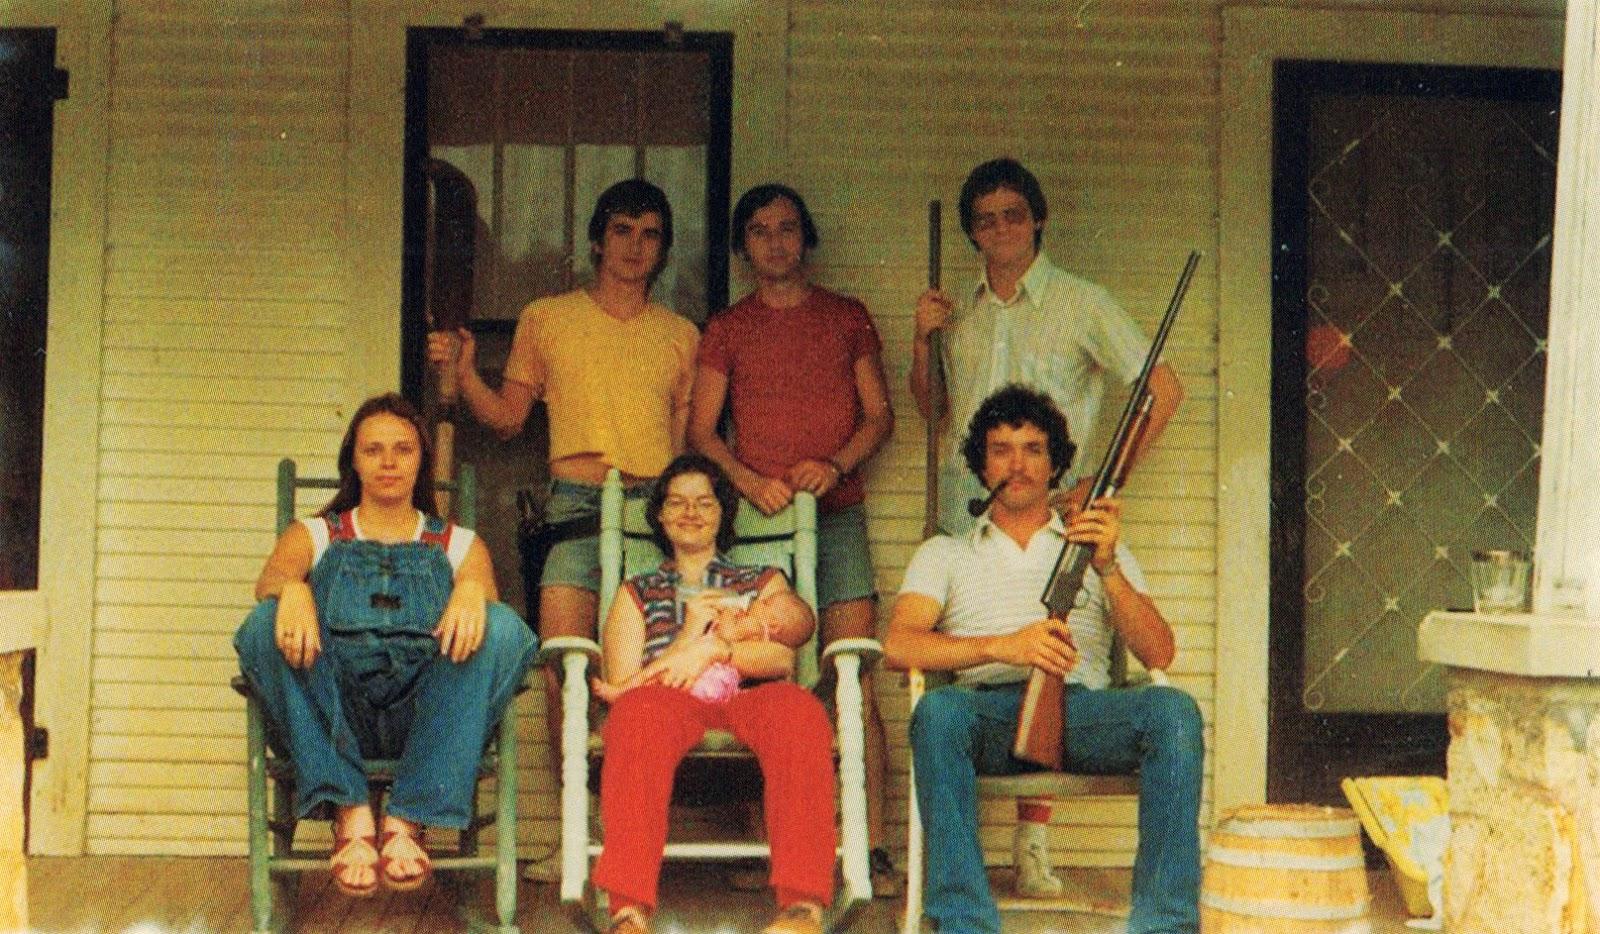 18 Awkward Family Studio Portraits of the 1980s  vintage